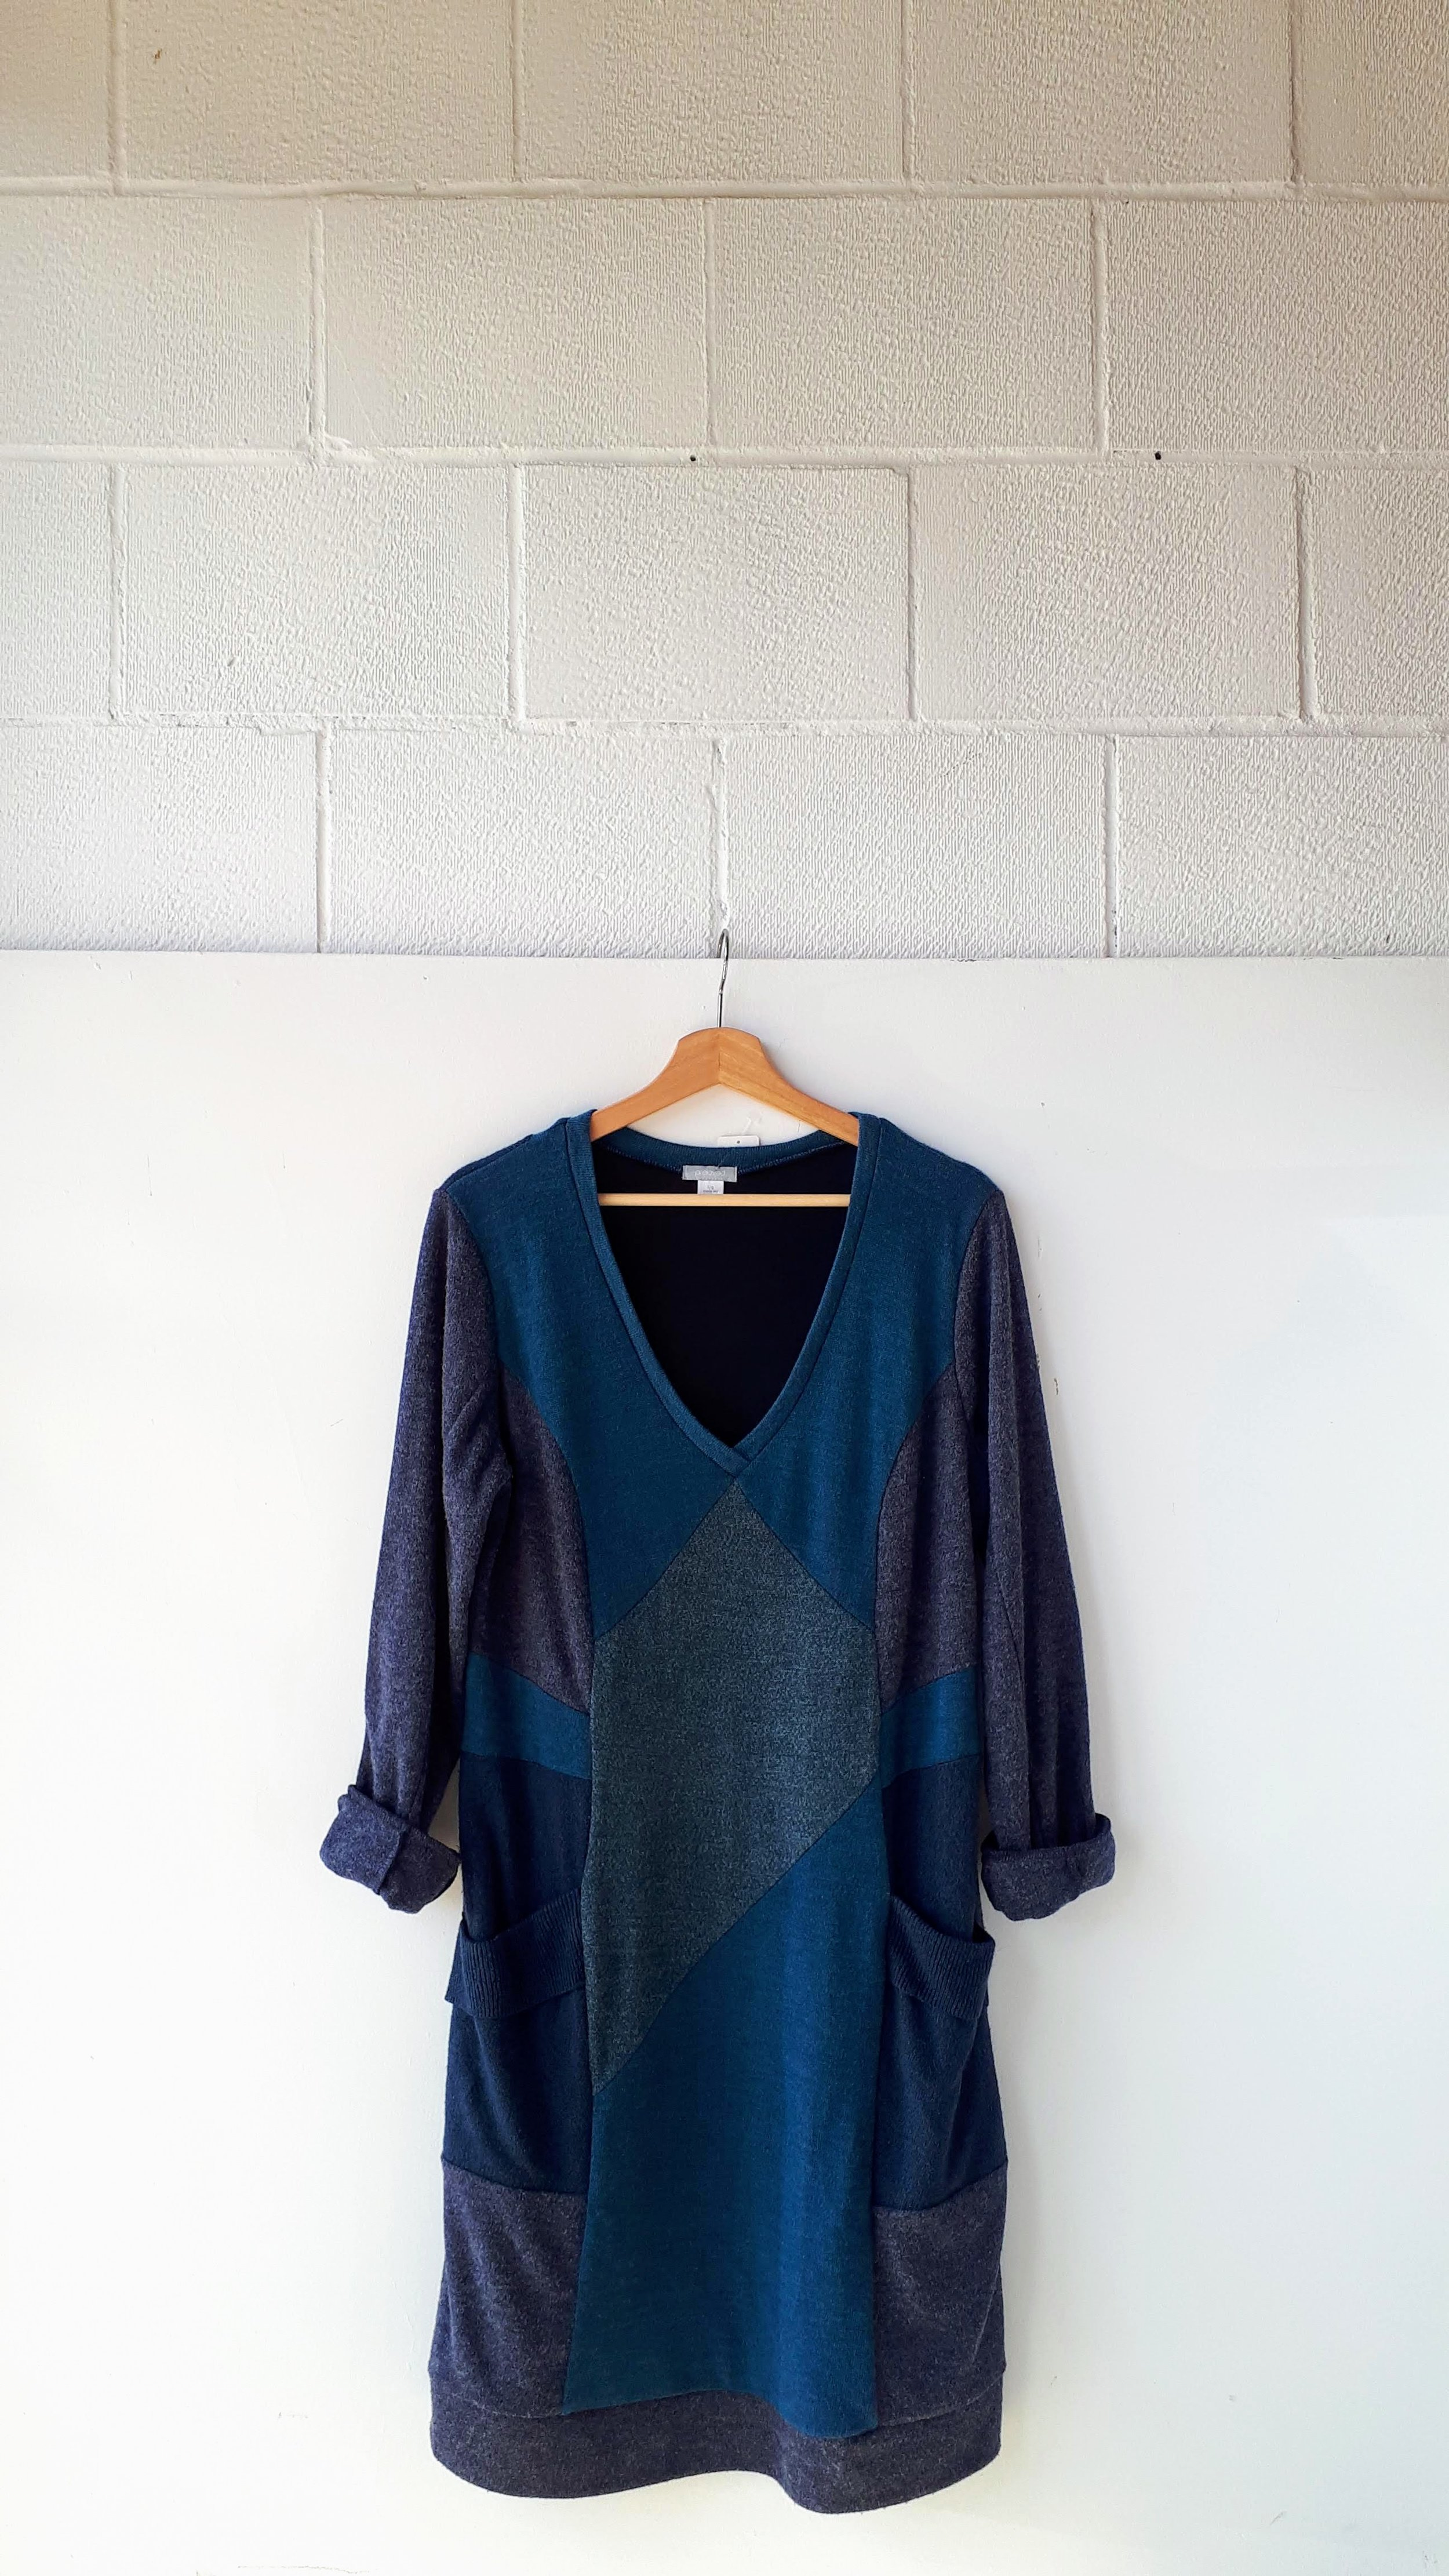 Preloved dress; Size L, $40